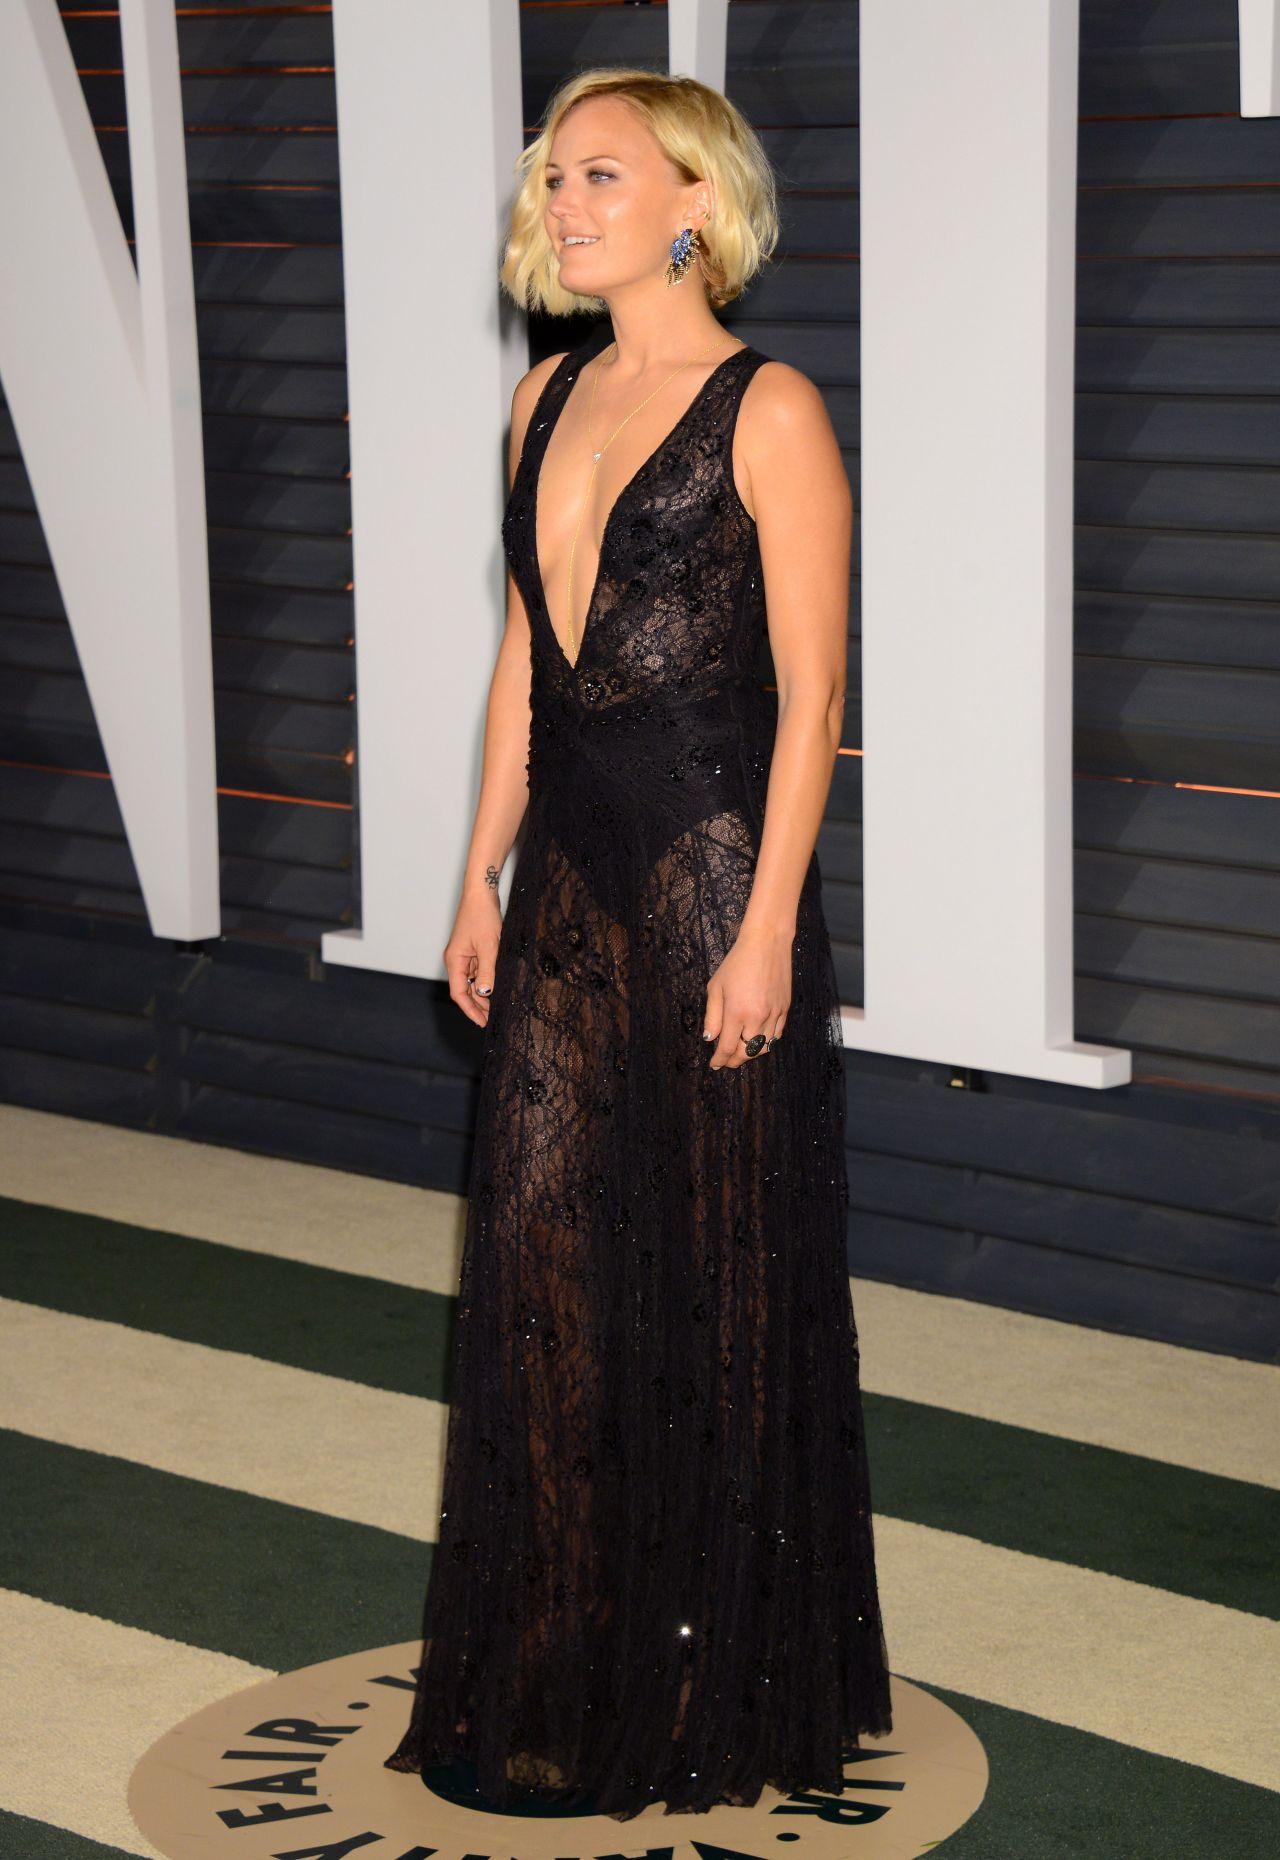 Malin Akerman - 2015 Celebrity Photos - Vanity Fair Oscar ... Malin Akerman